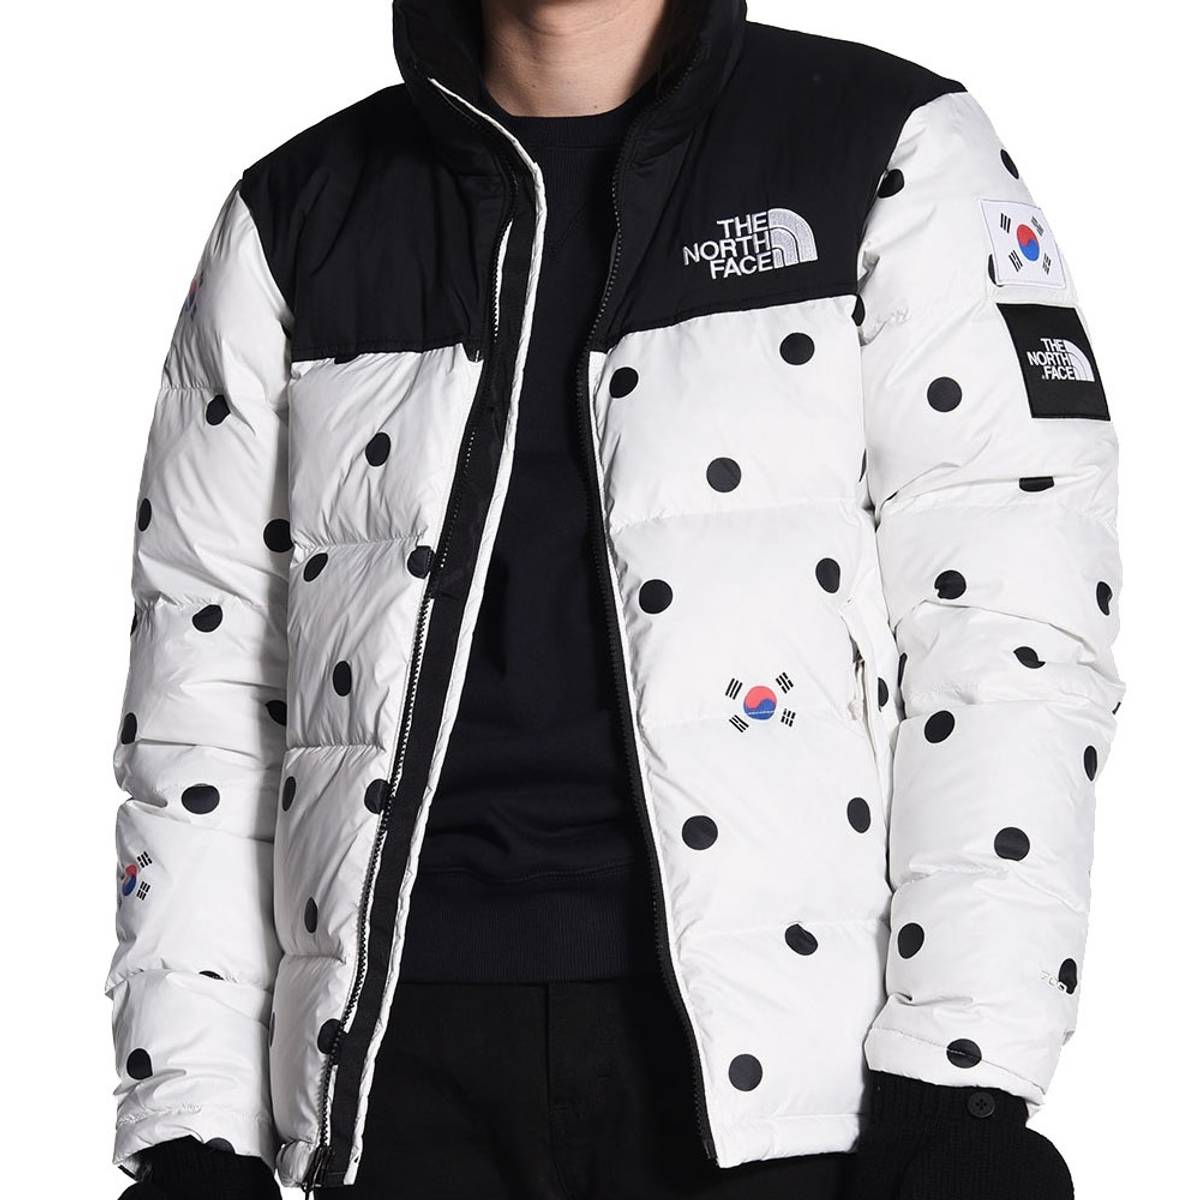 The North Face The North Face Nuptse Jacket South Korea Polka Dots Size M $495